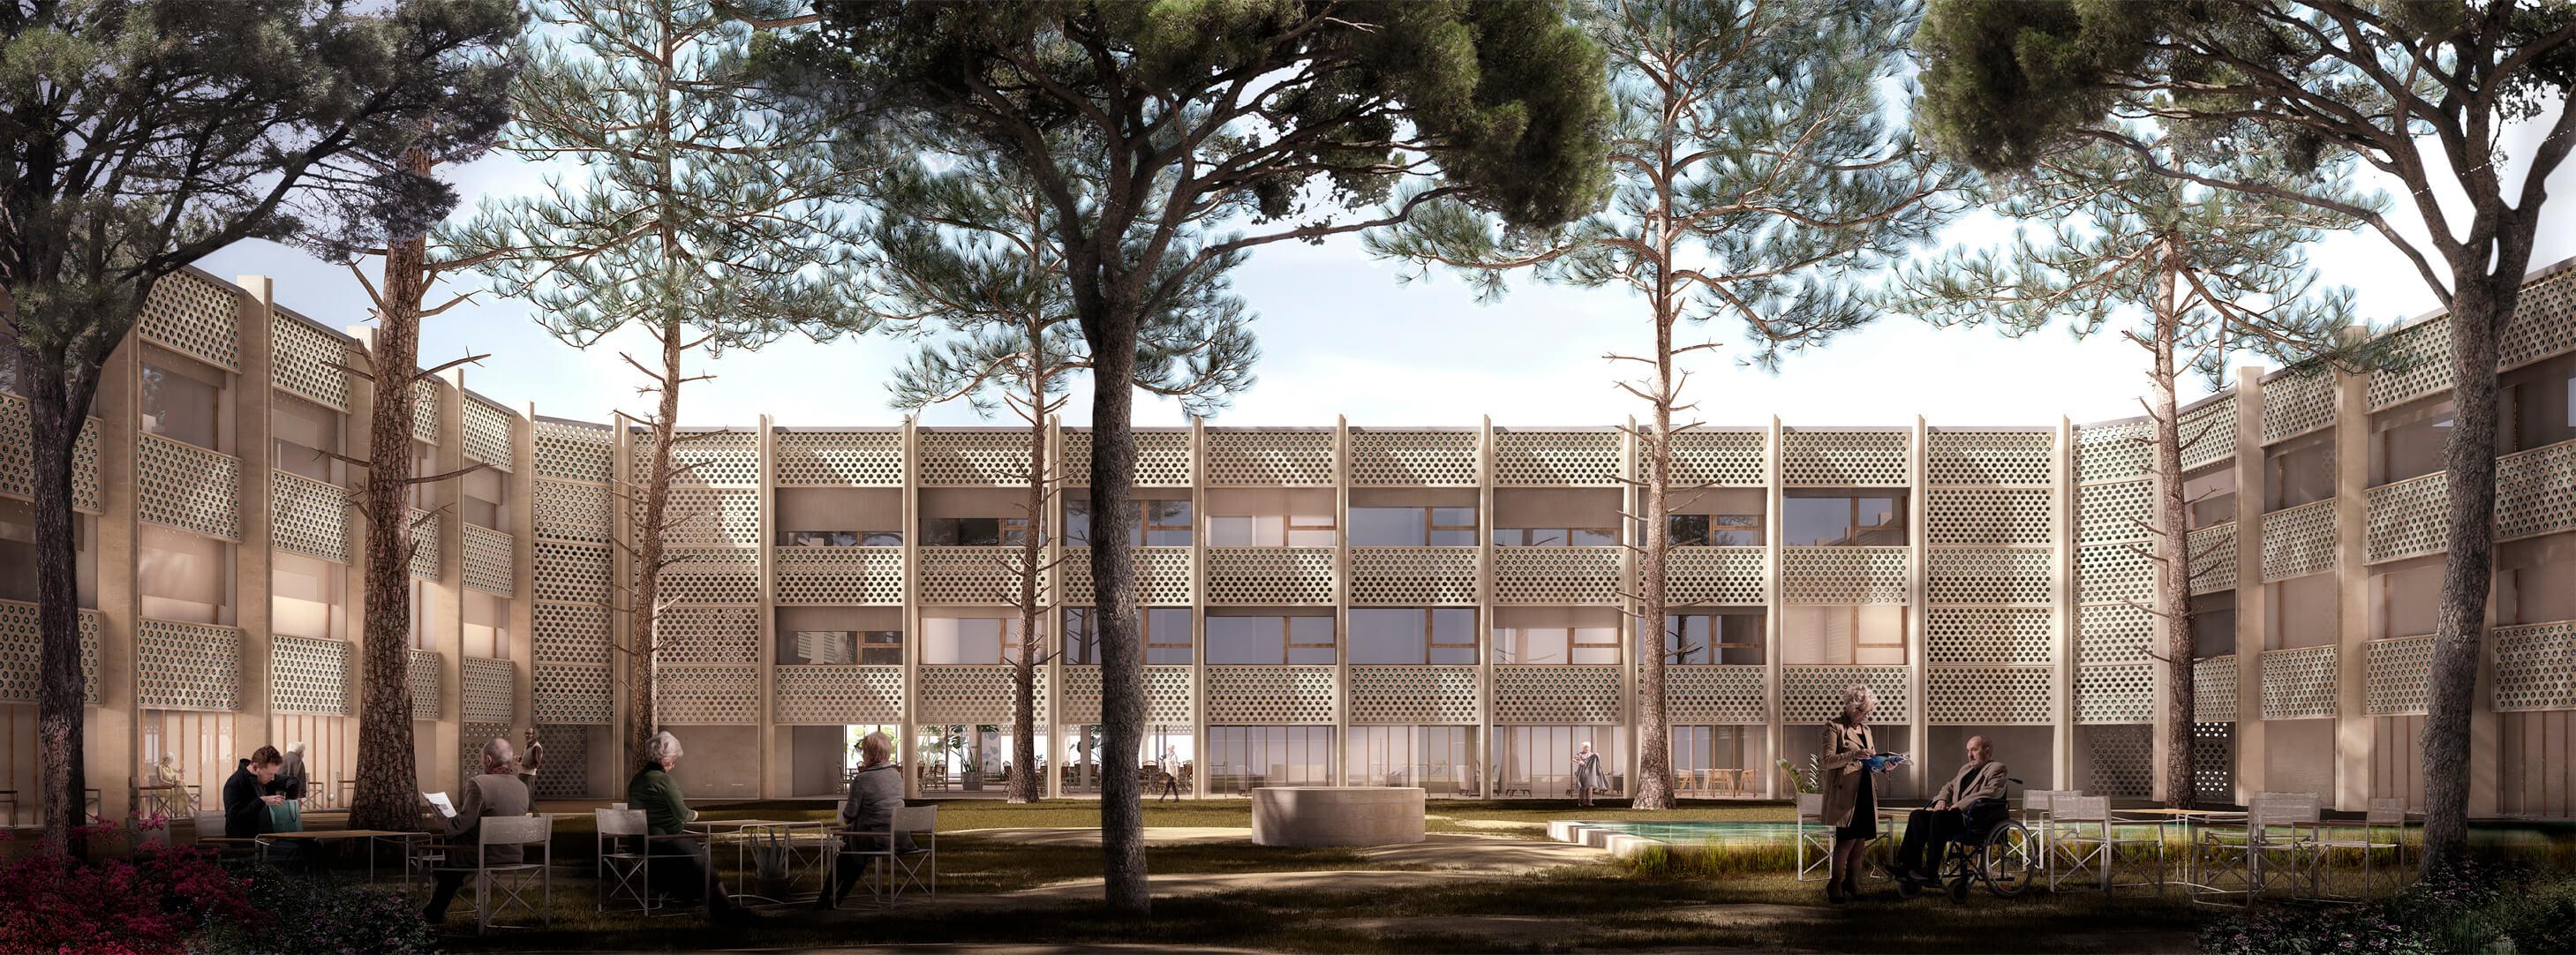 28-Residencia - Jorge Vidal